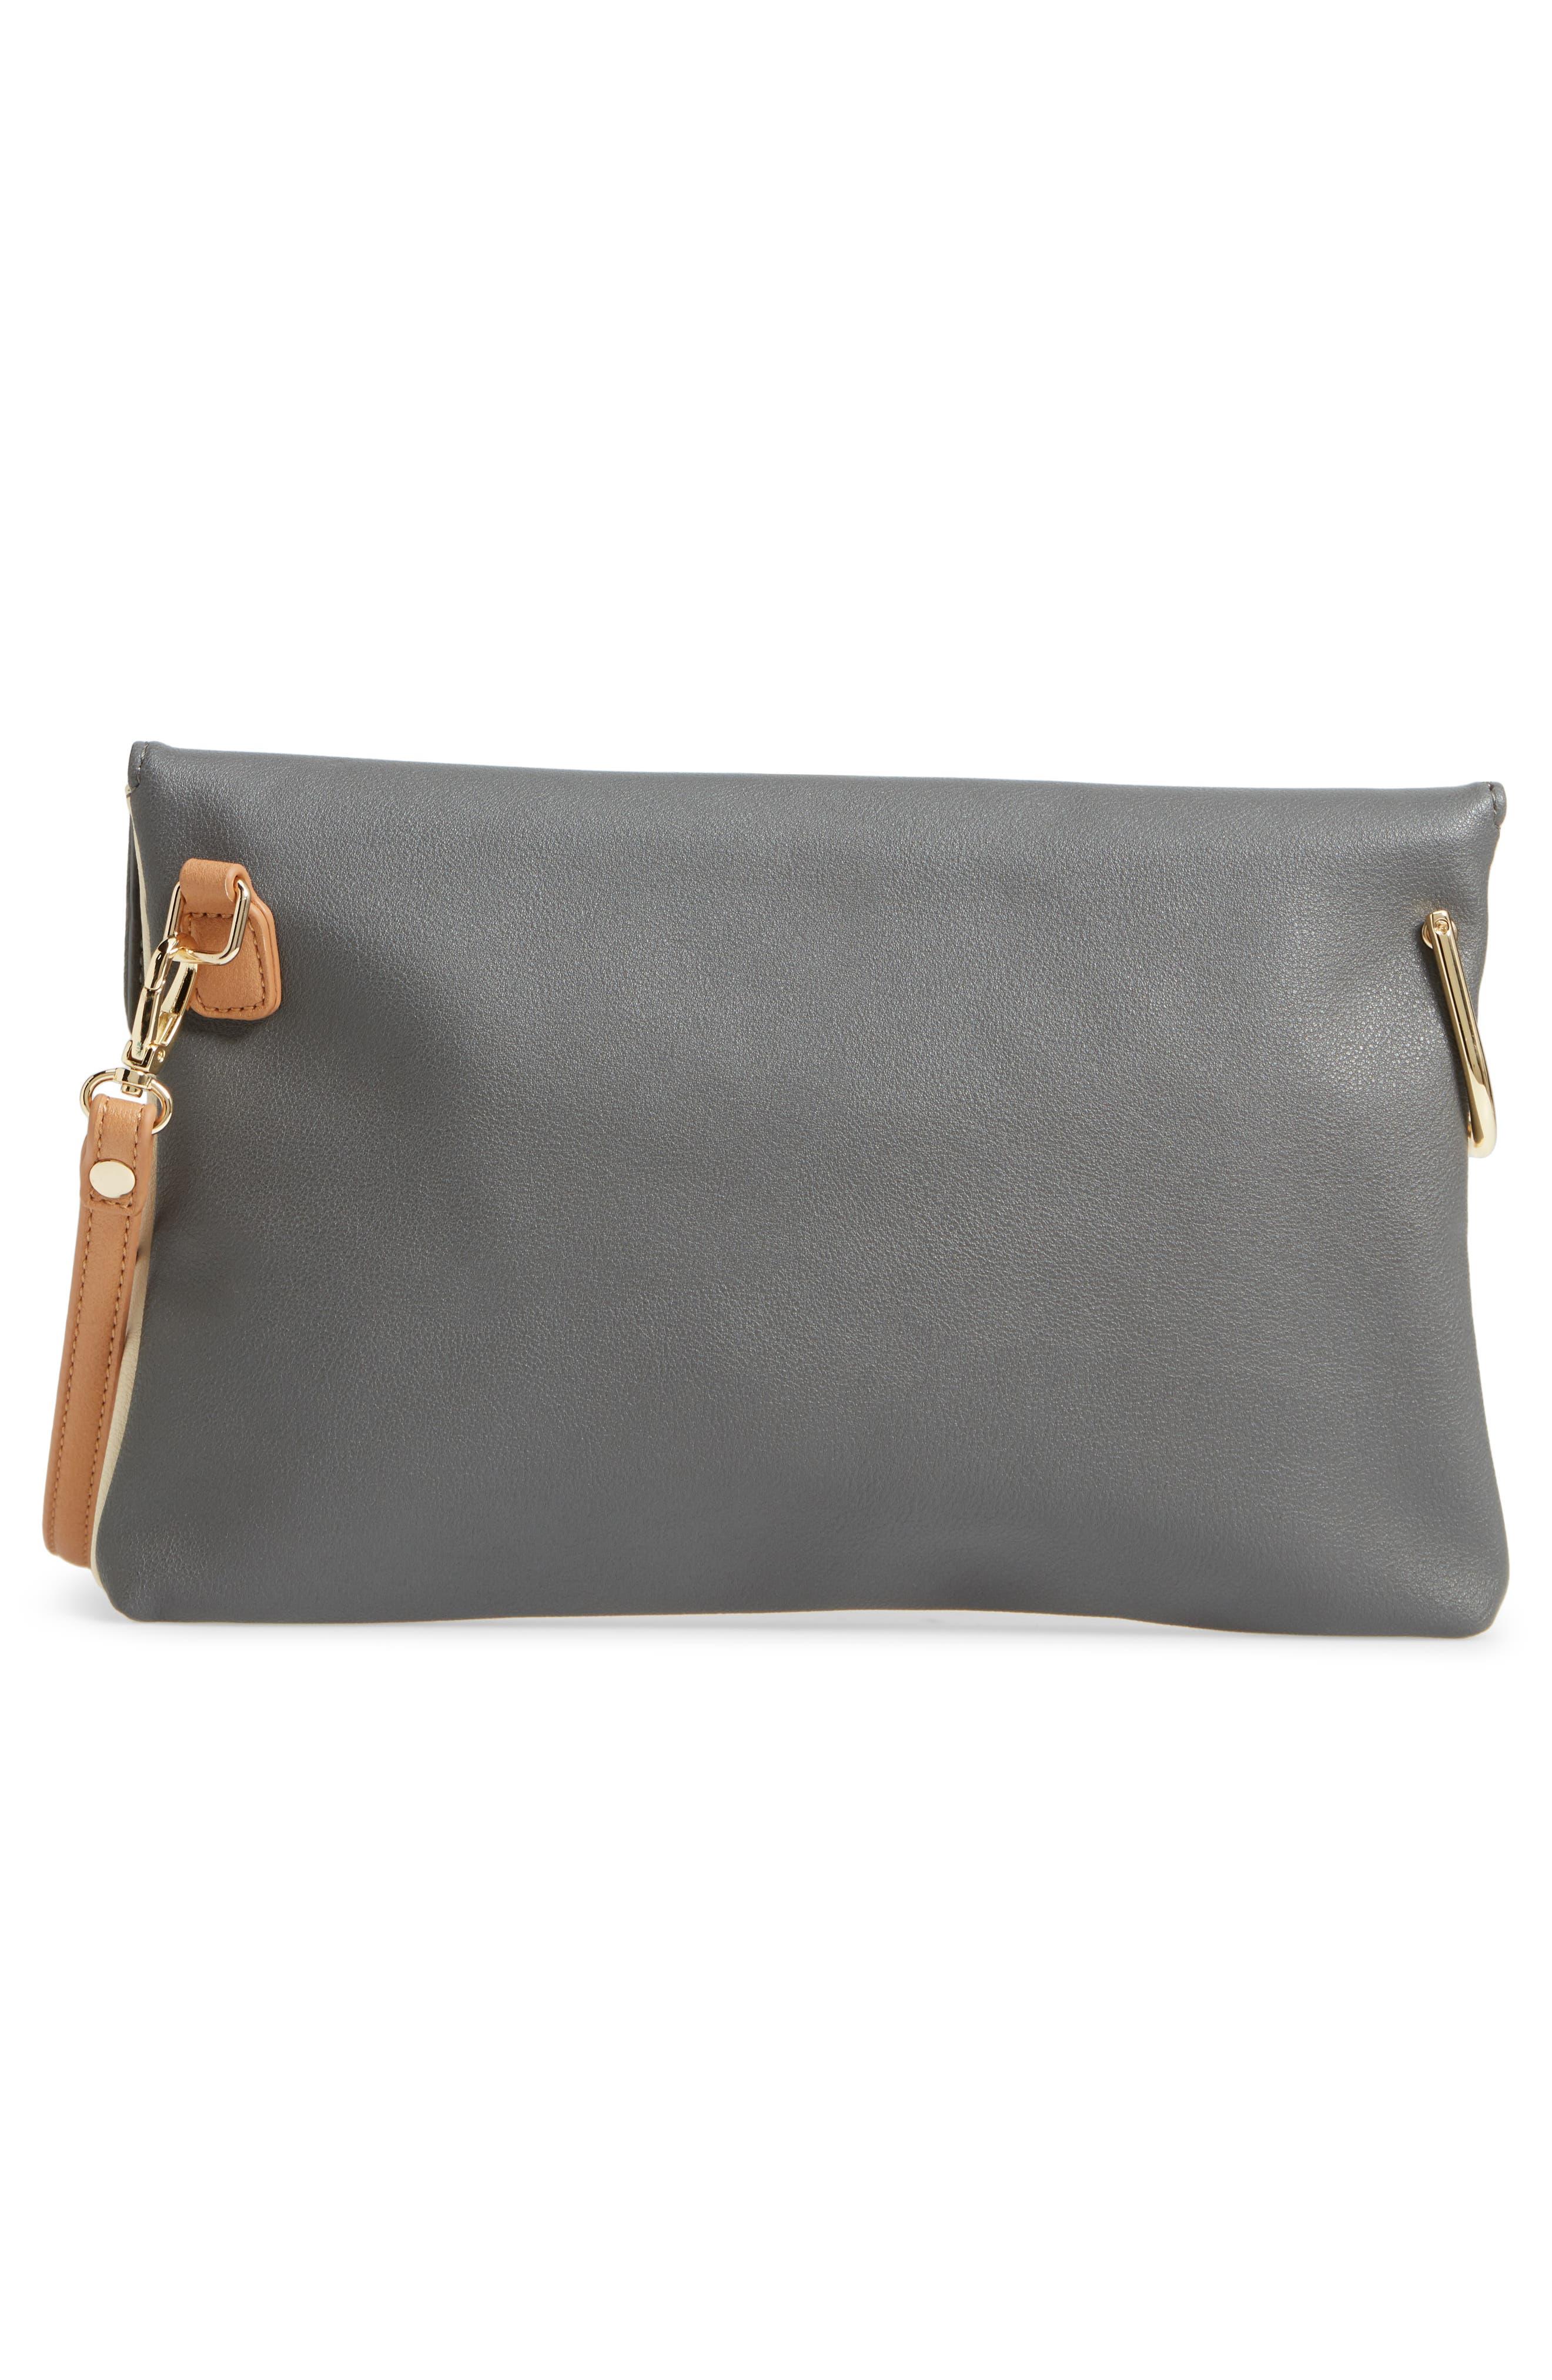 Shea Tricolor Faux Leather Clutch,                             Alternate thumbnail 3, color,                             Grey Multi